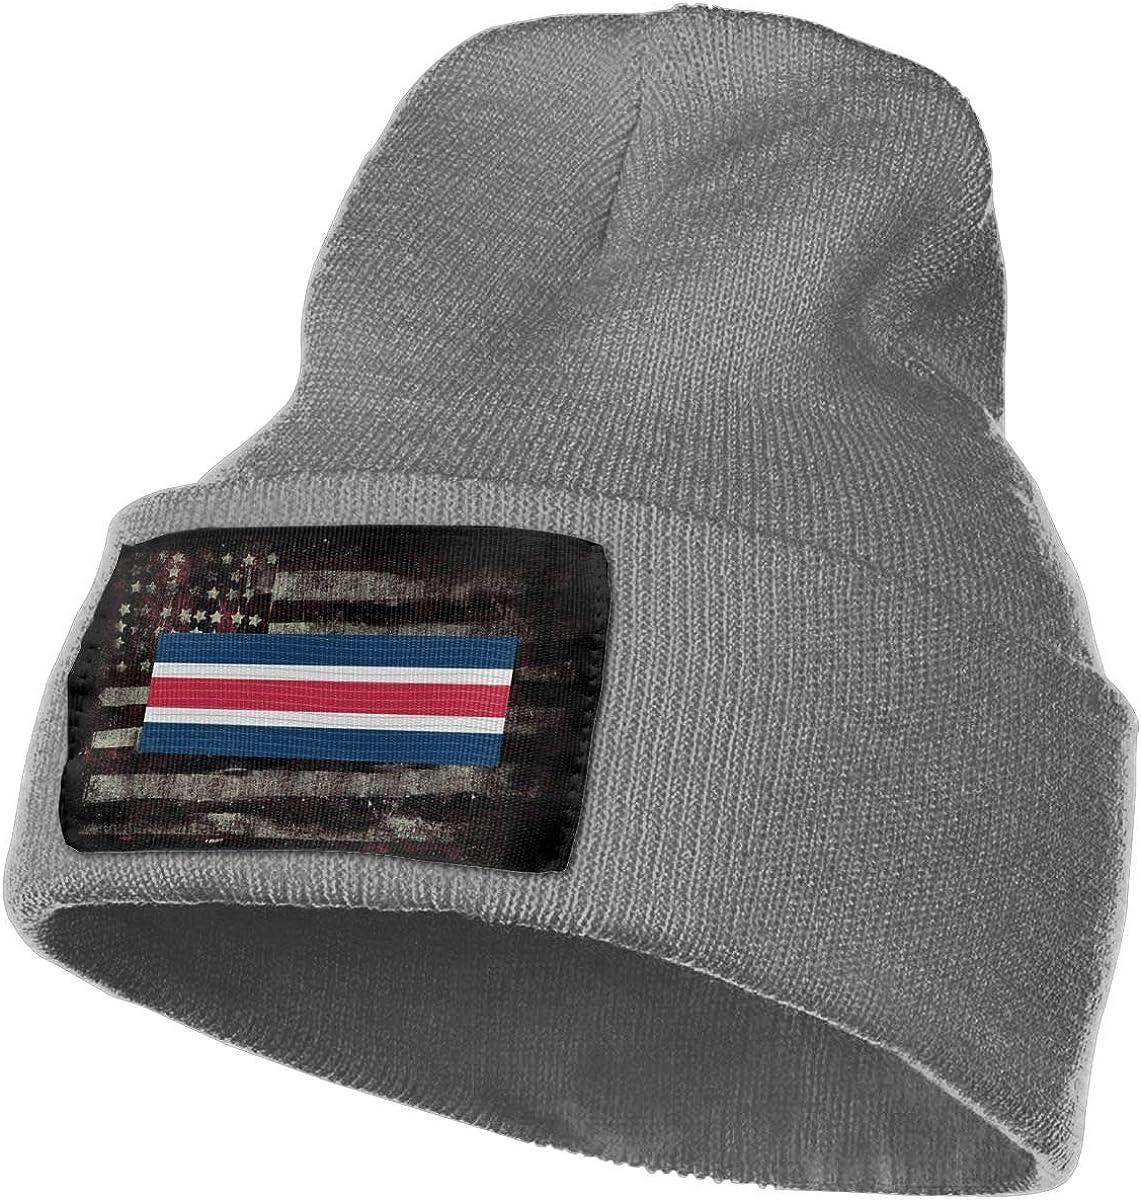 FORDSAN CP US Army Reserve Component Overseas Training Ribbon Mens Beanie Cap Skull Cap Winter Warm Knitting Hats.